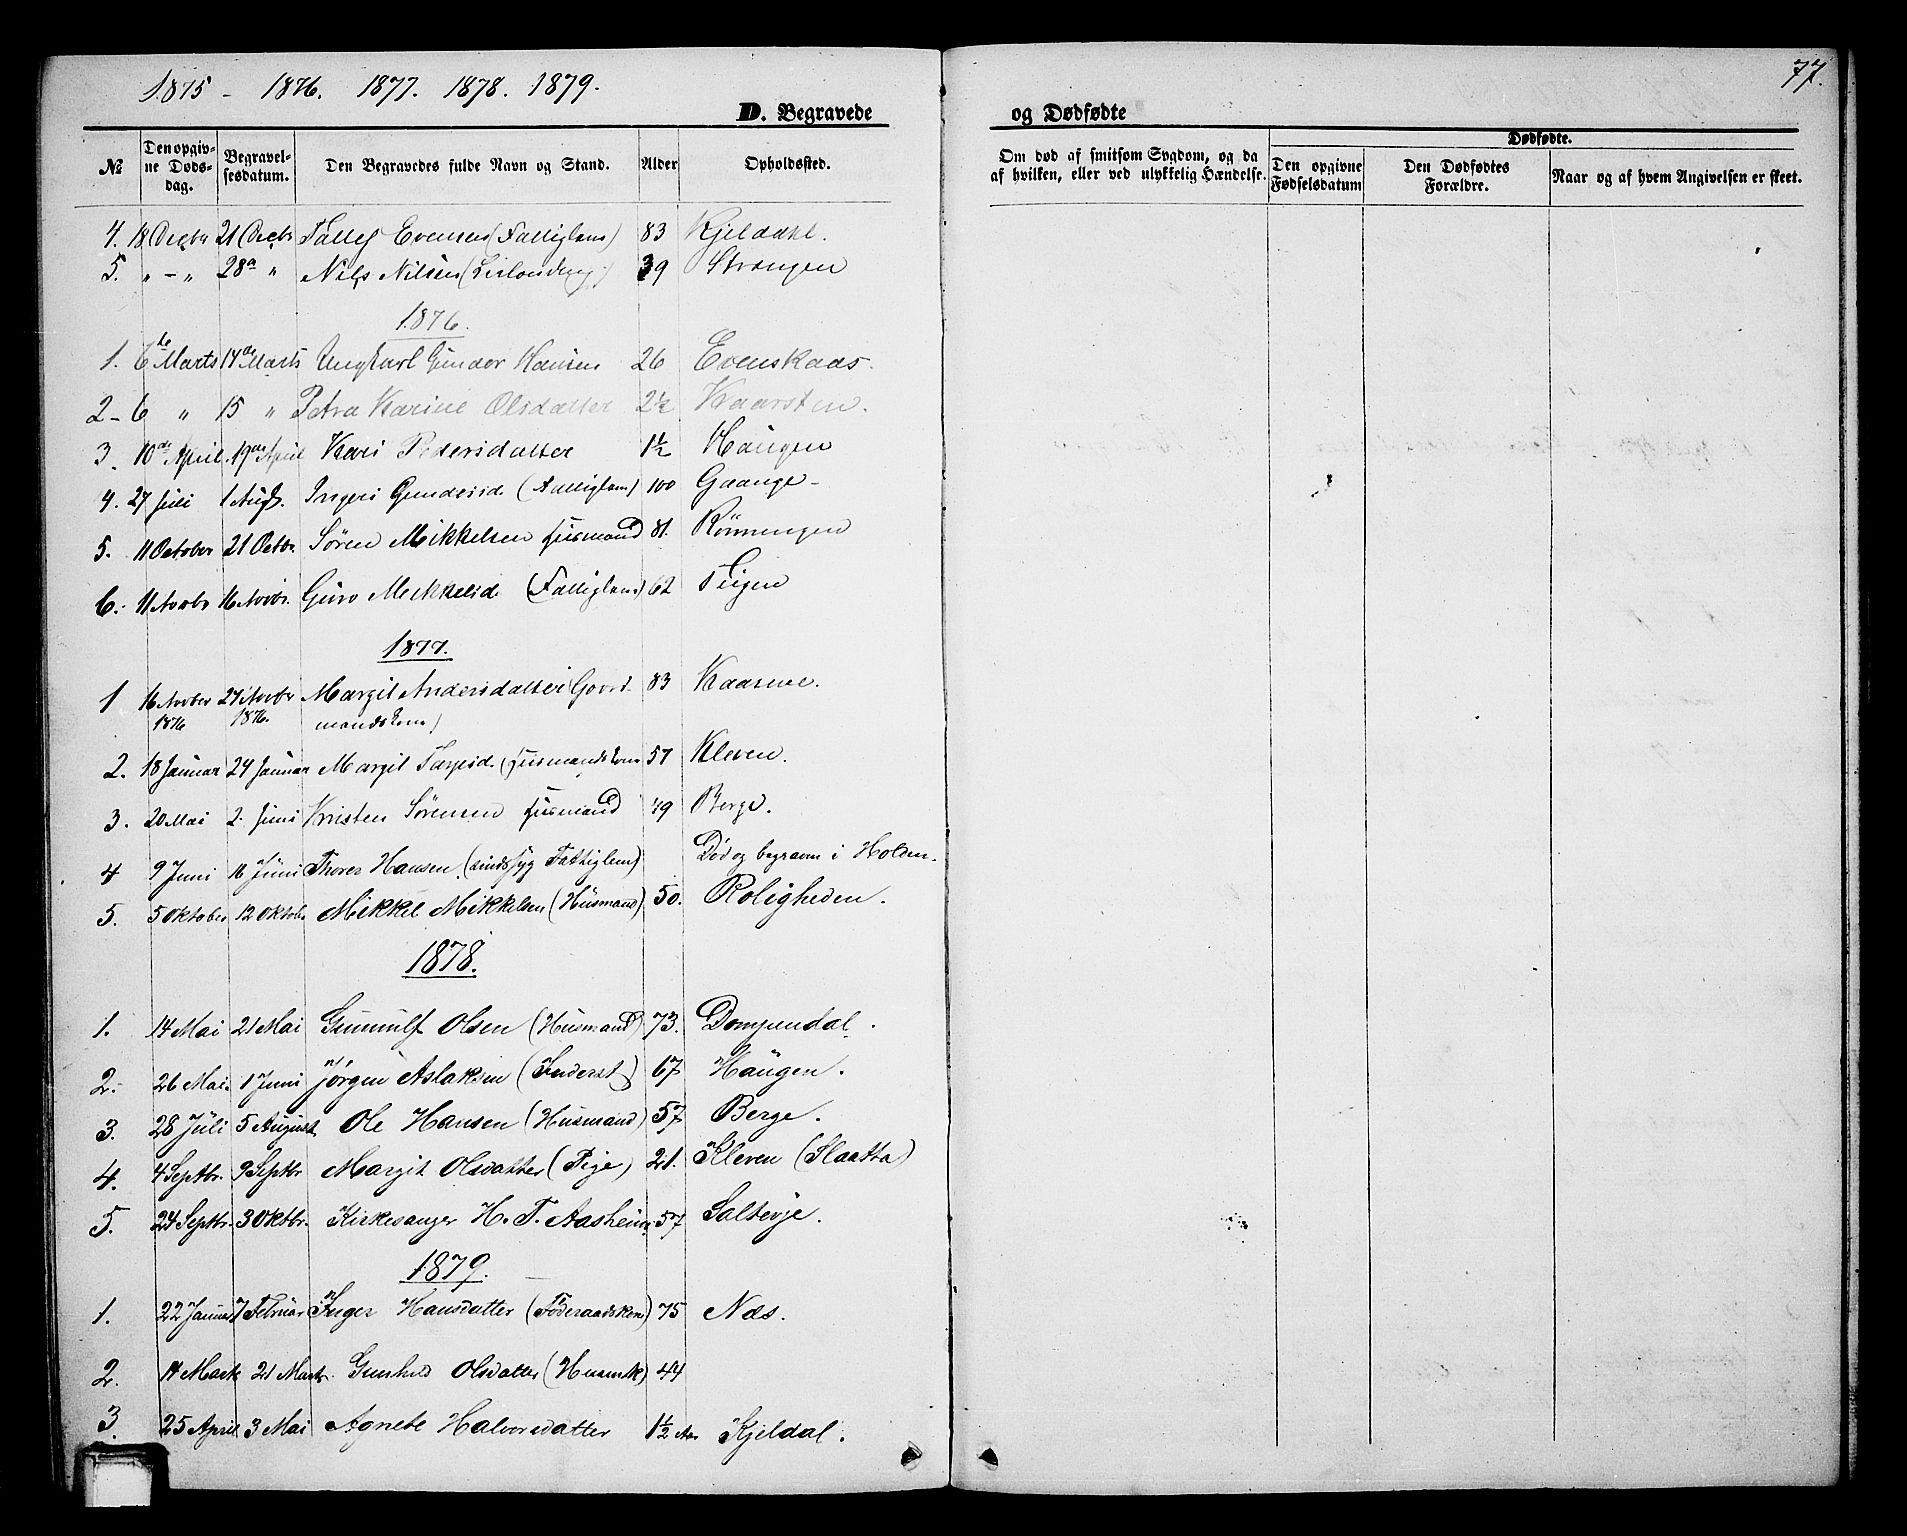 SAKO, Lunde kirkebøker, G/Gb/L0001: Klokkerbok nr. II 1, 1866-1887, s. 77